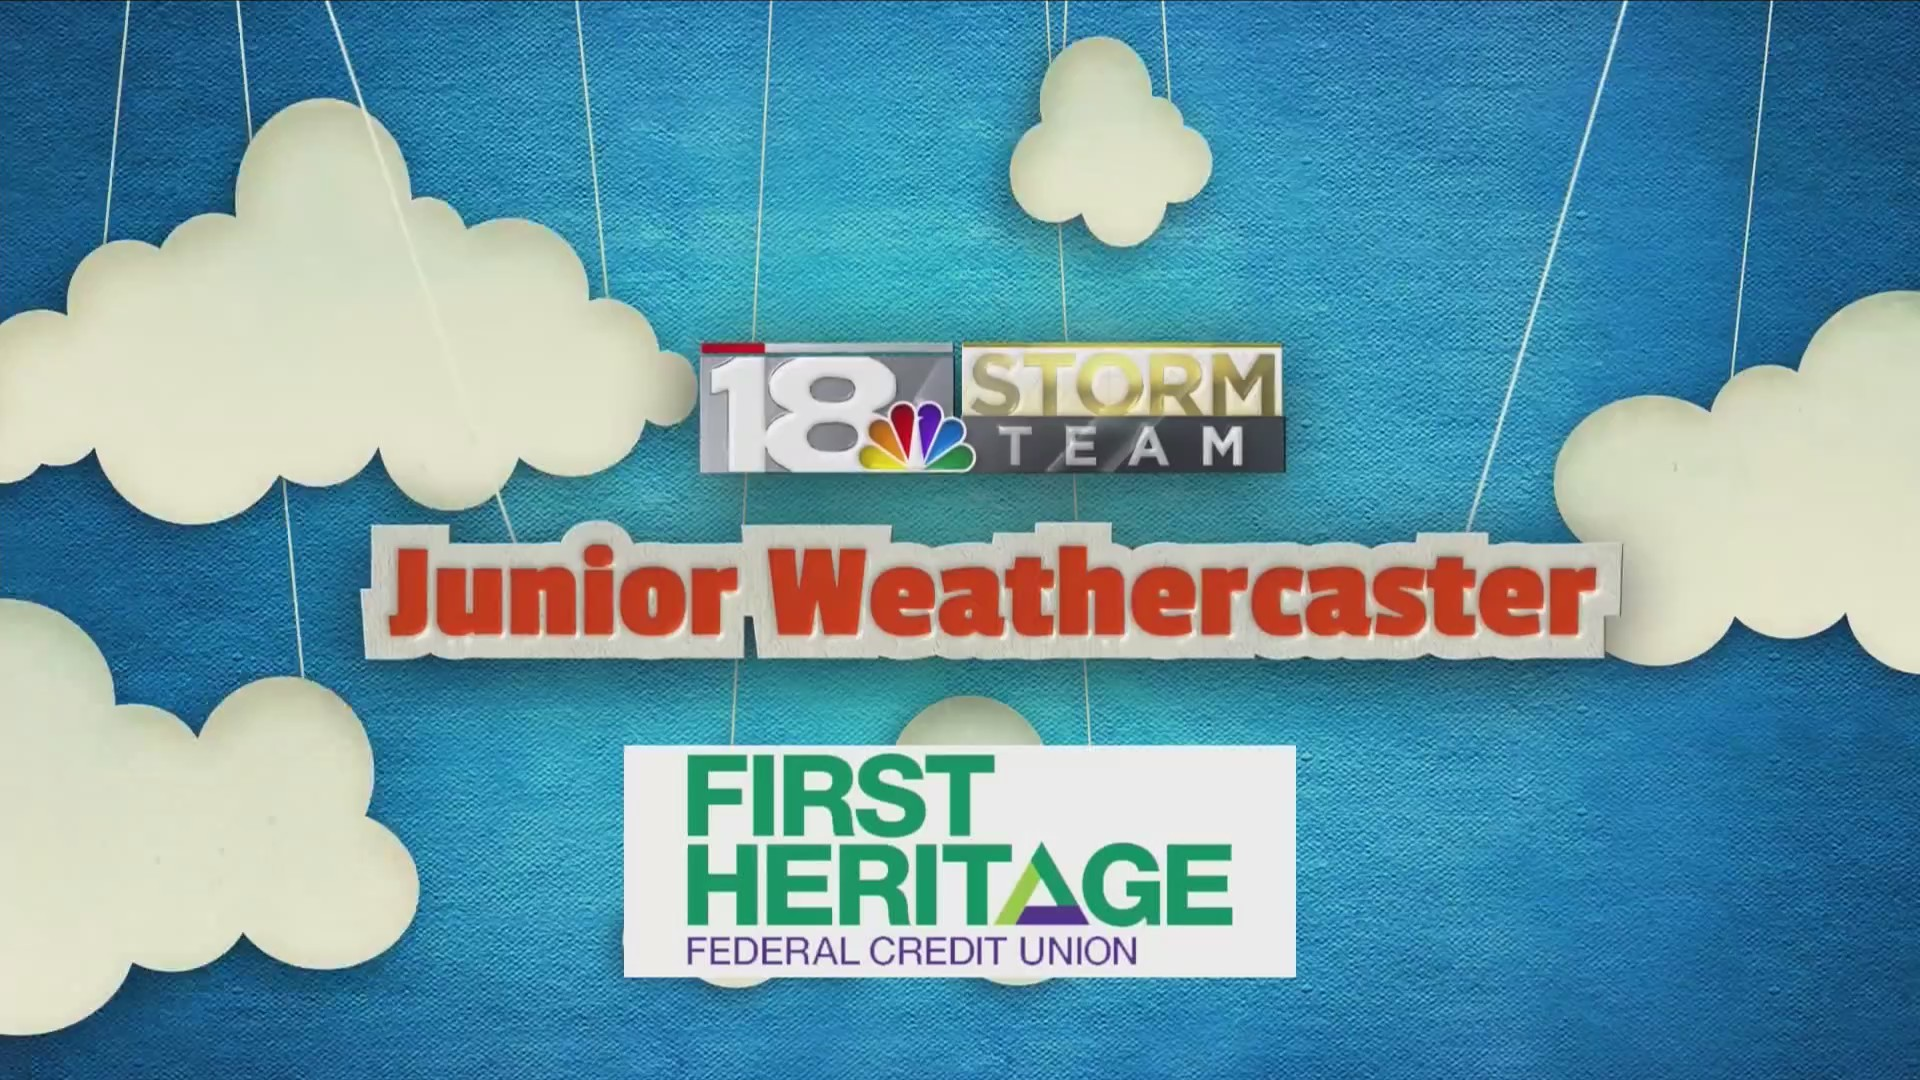 Junior Weathercaster: Jack Cheresnowsky